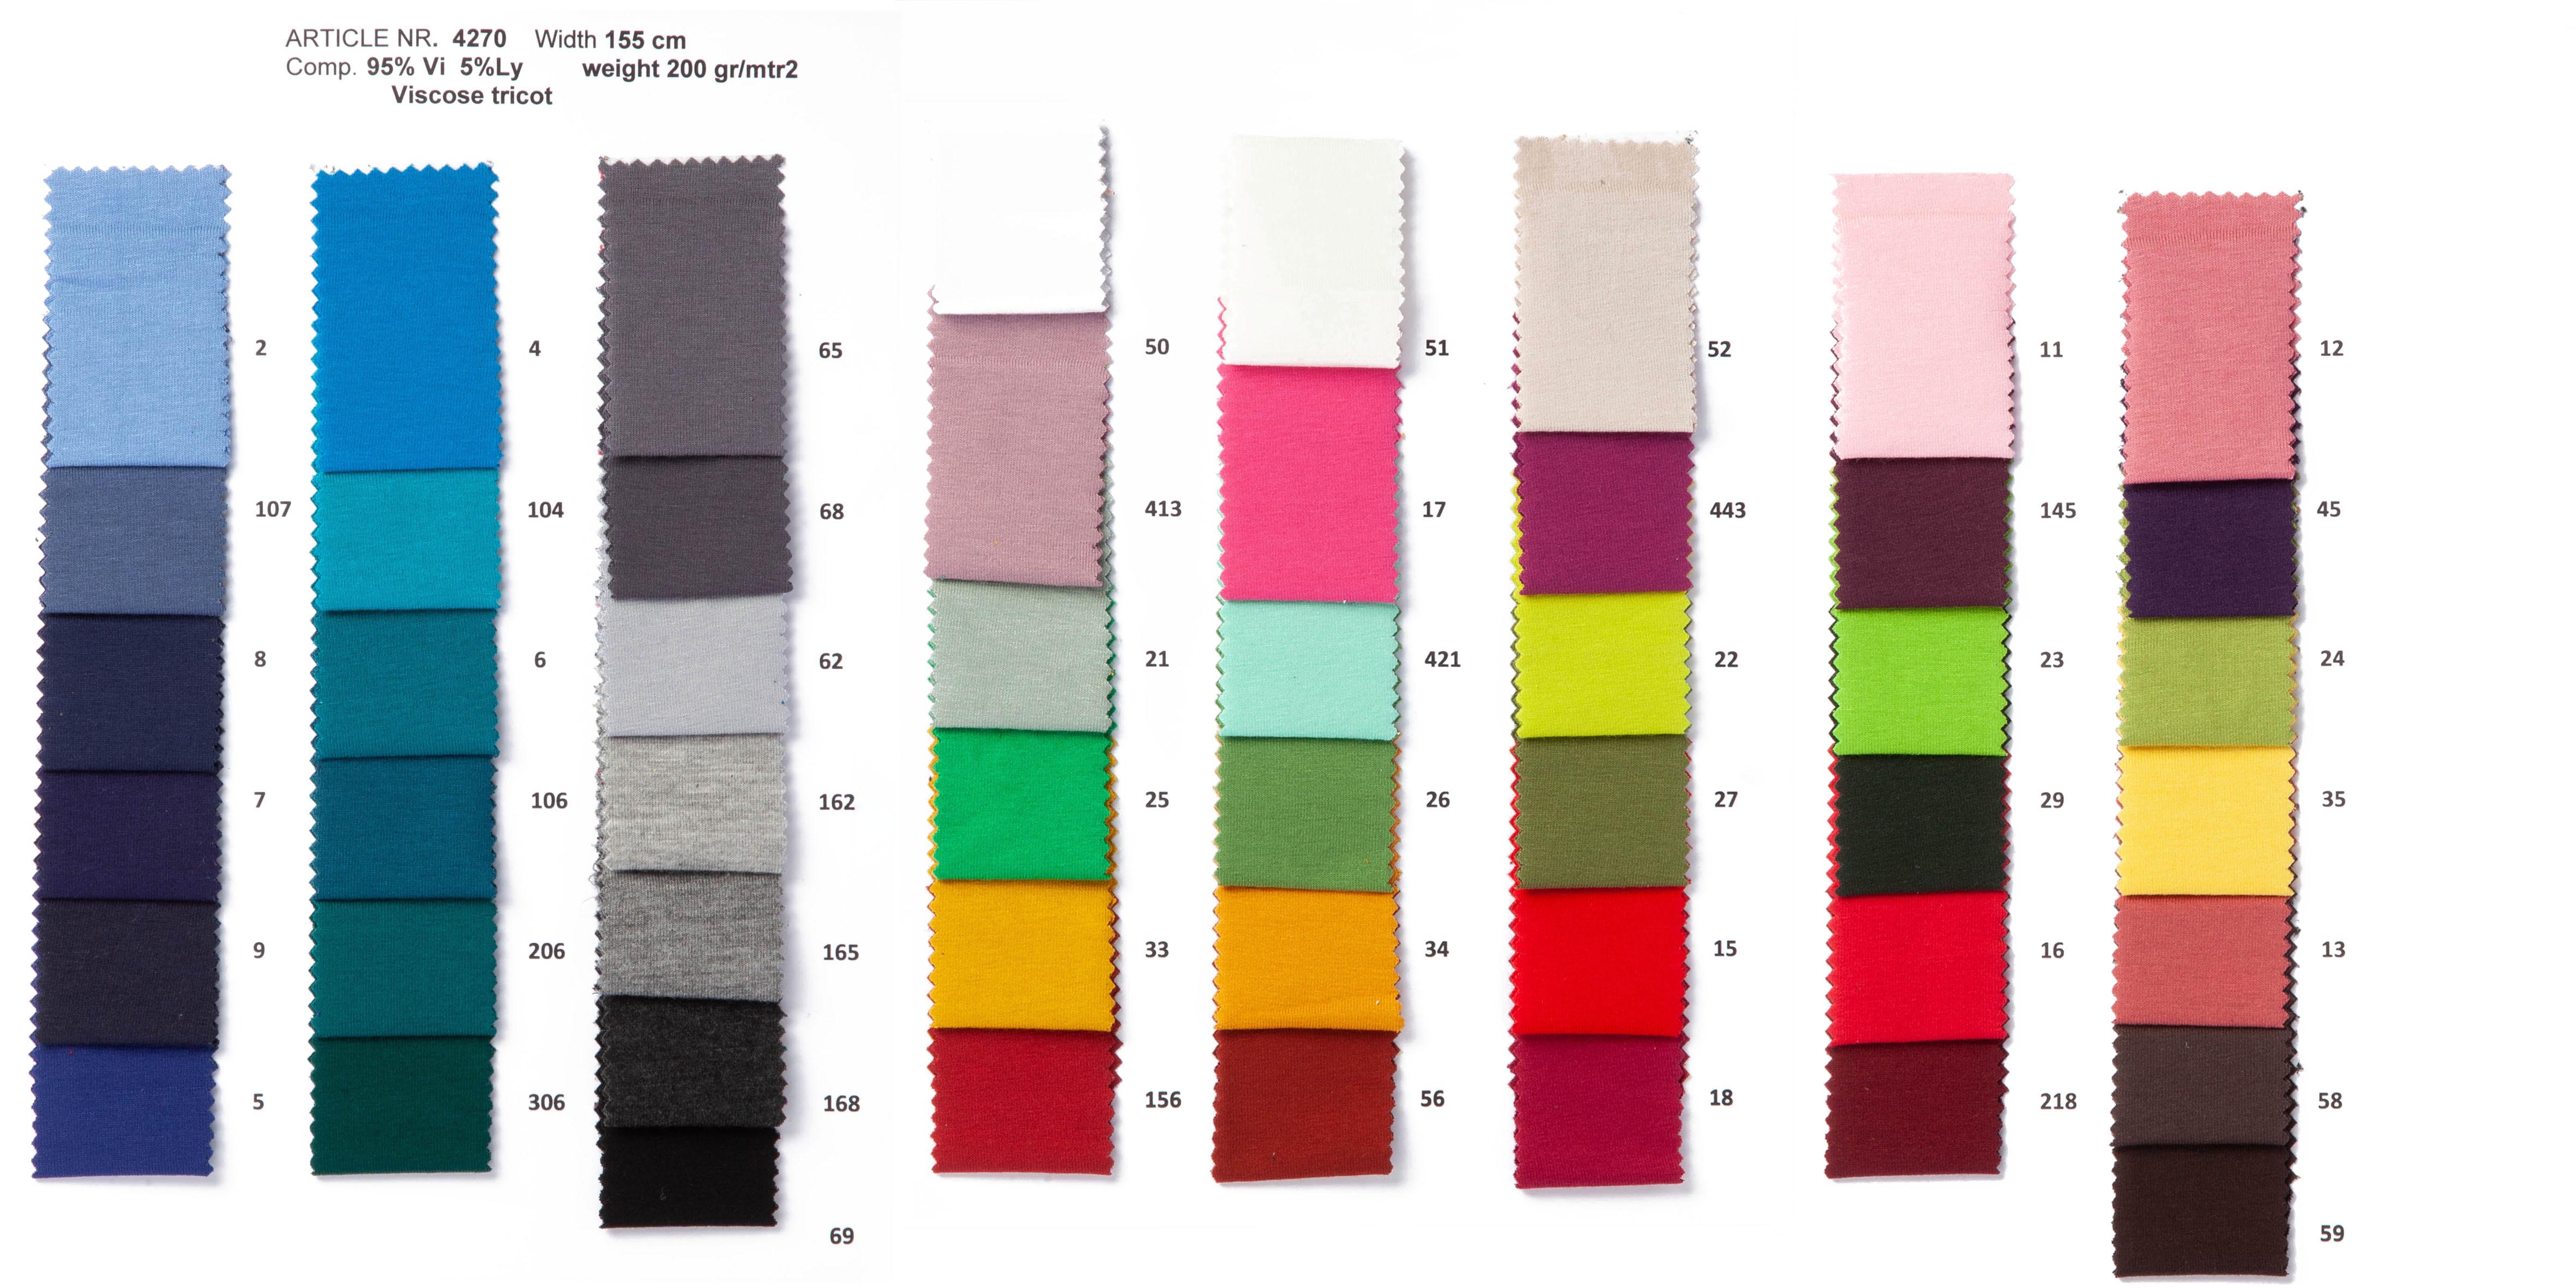 kleurenkaart1540319352